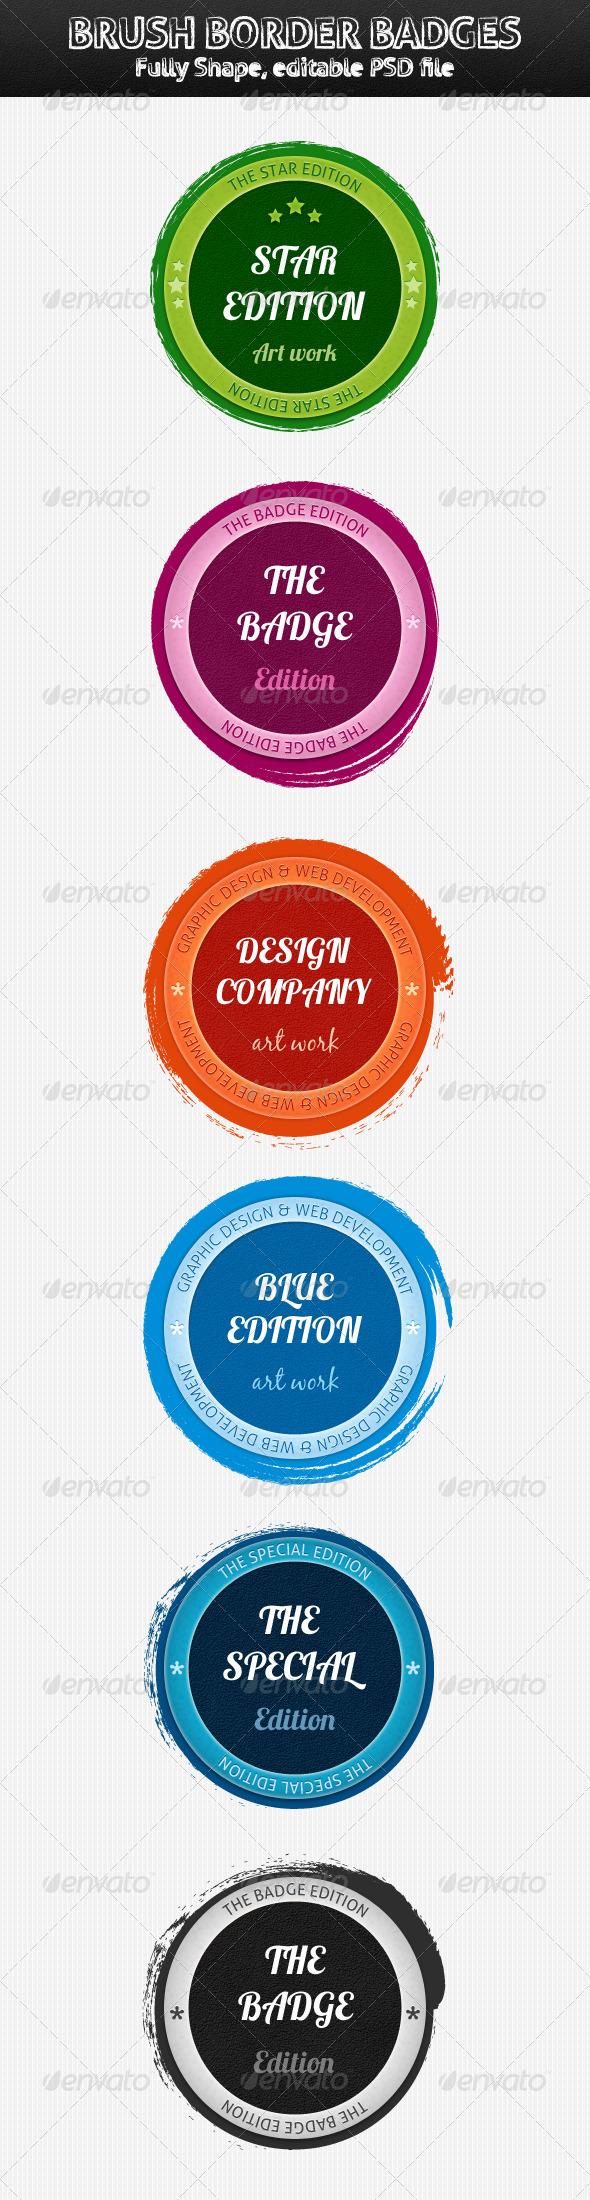 GraphicRiver Brush Border Badges 3277062